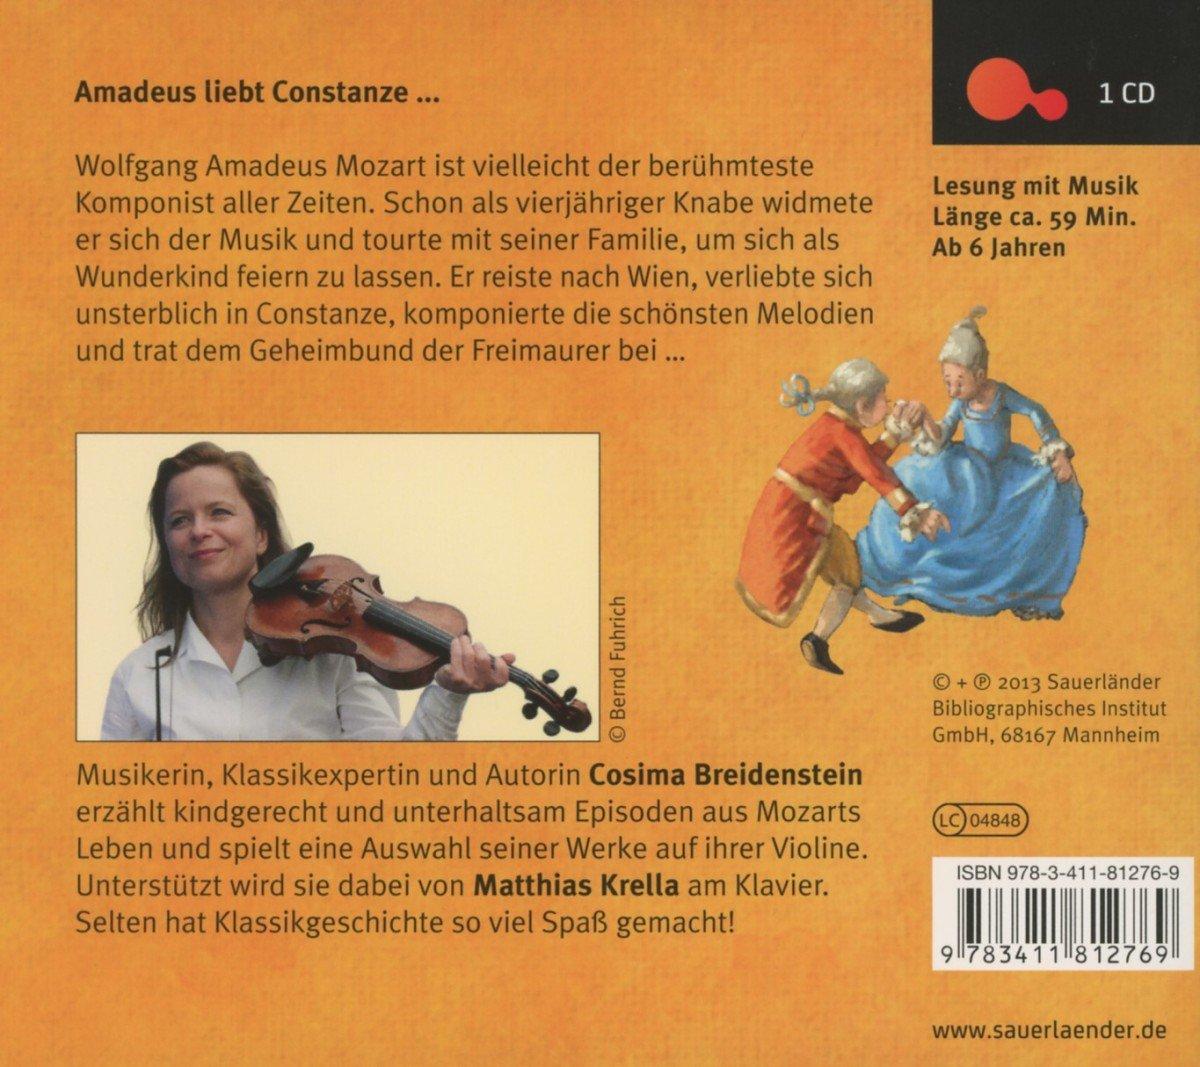 Abenteuer Klassik Mozart Sauerländer Hörbuch Tonträger Amazon